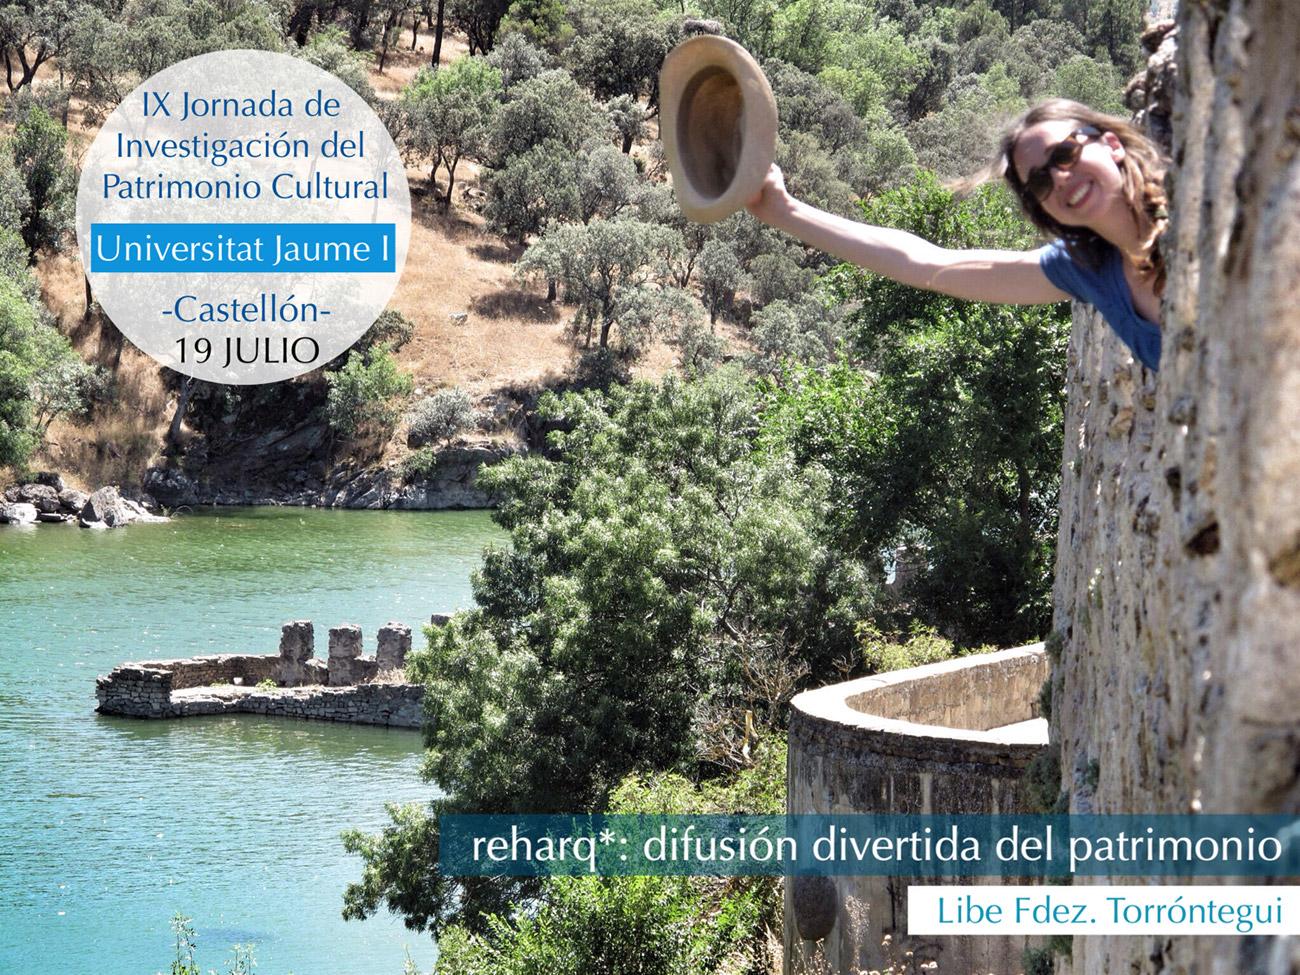 reharq_patrimonio_universitat jaume I_ Jornadas  Patrimonio